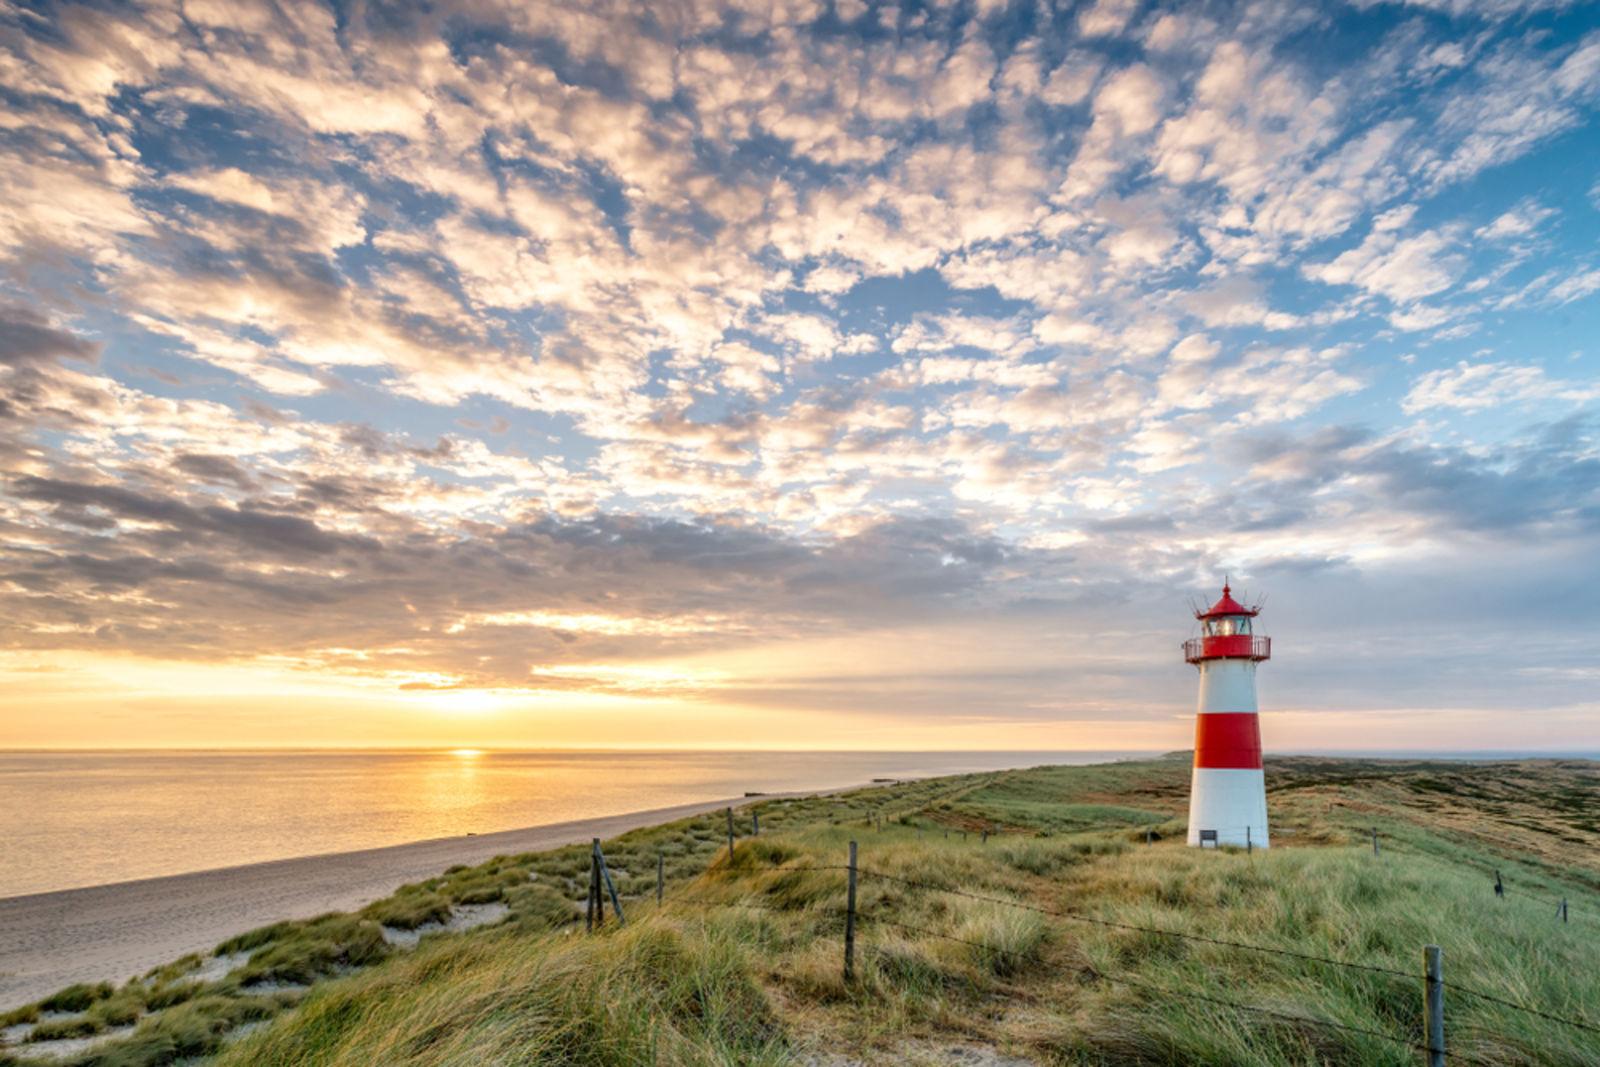 Leuchtturm am Lister Ellenbogen auf Sylt, Nordsee